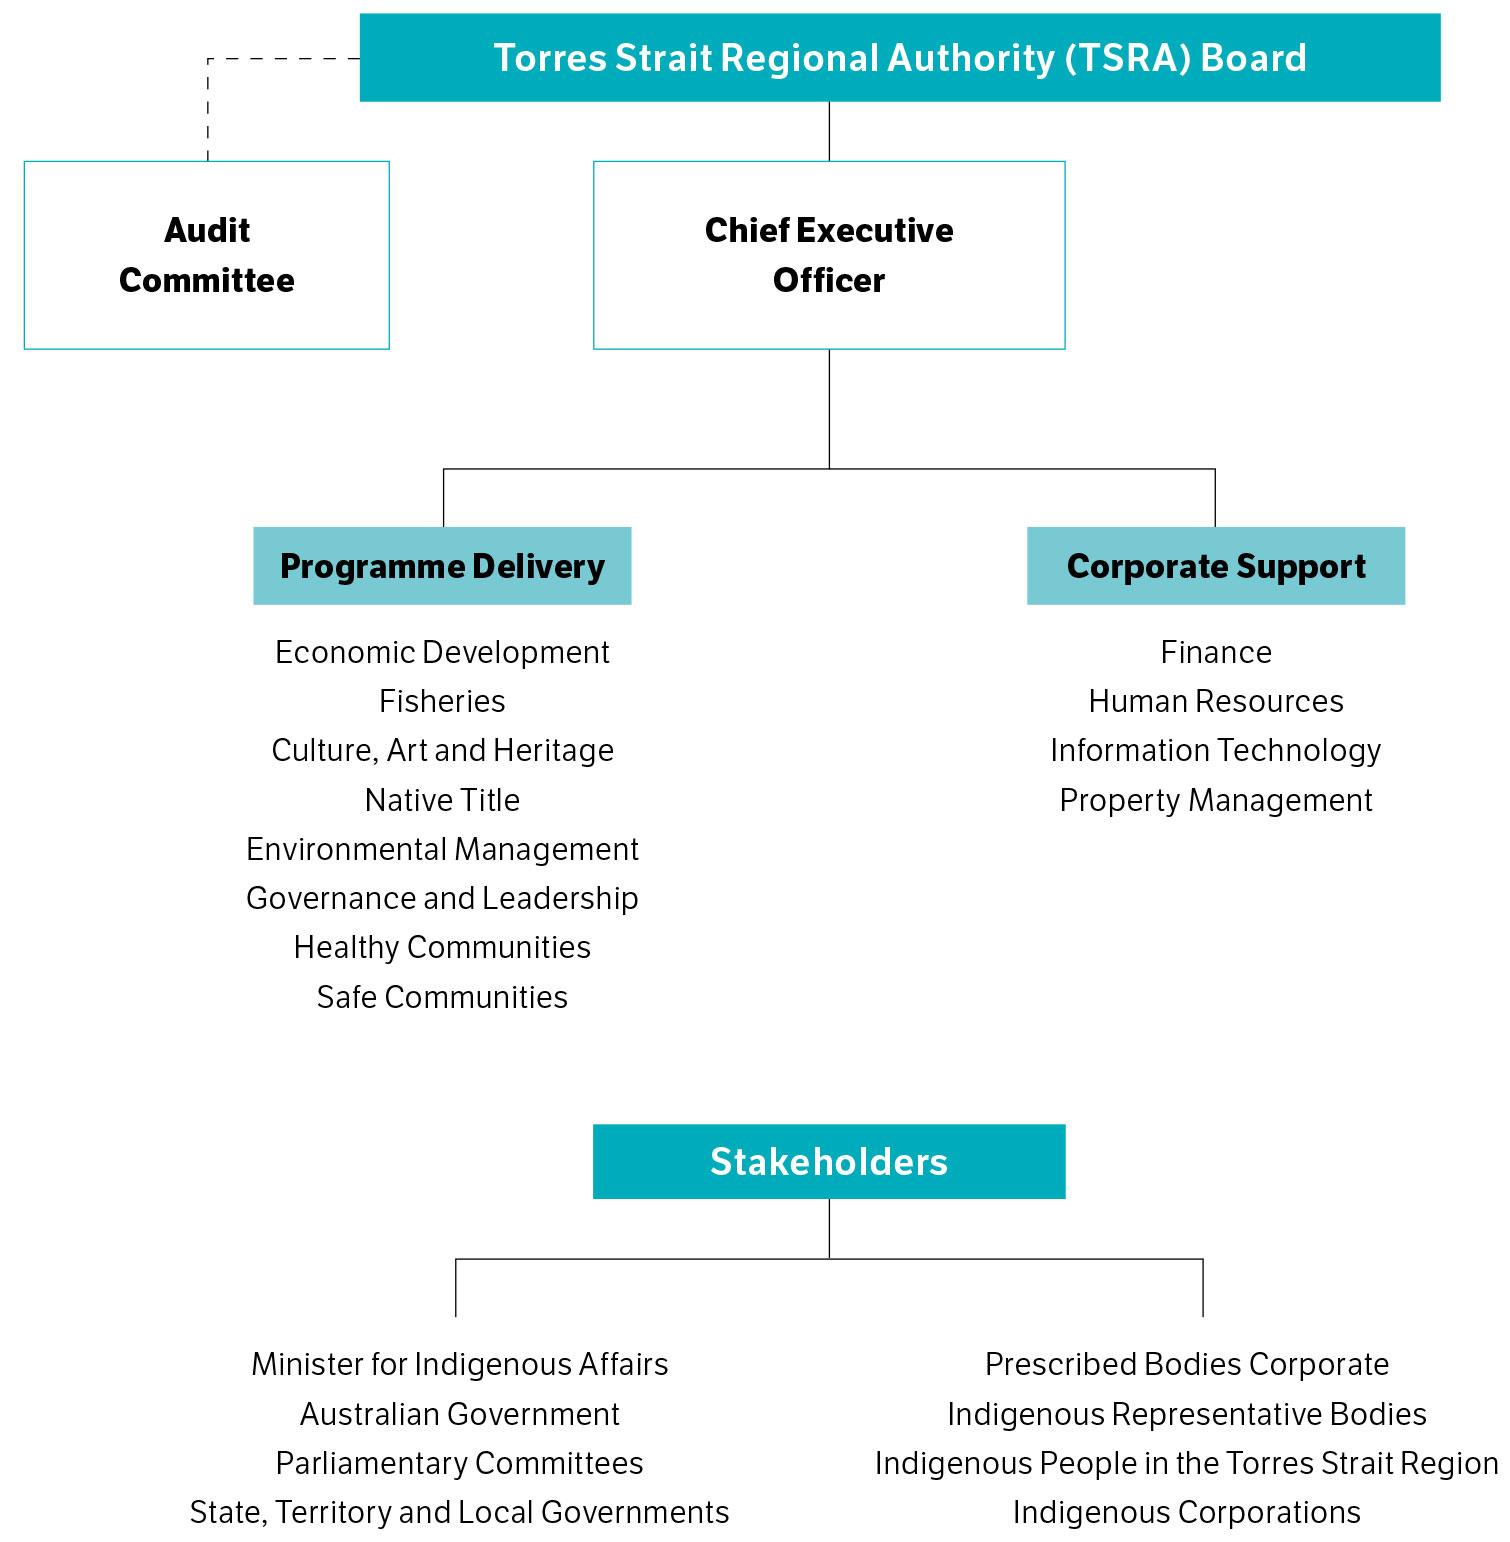 Torres Strait Regional Authority governance framework